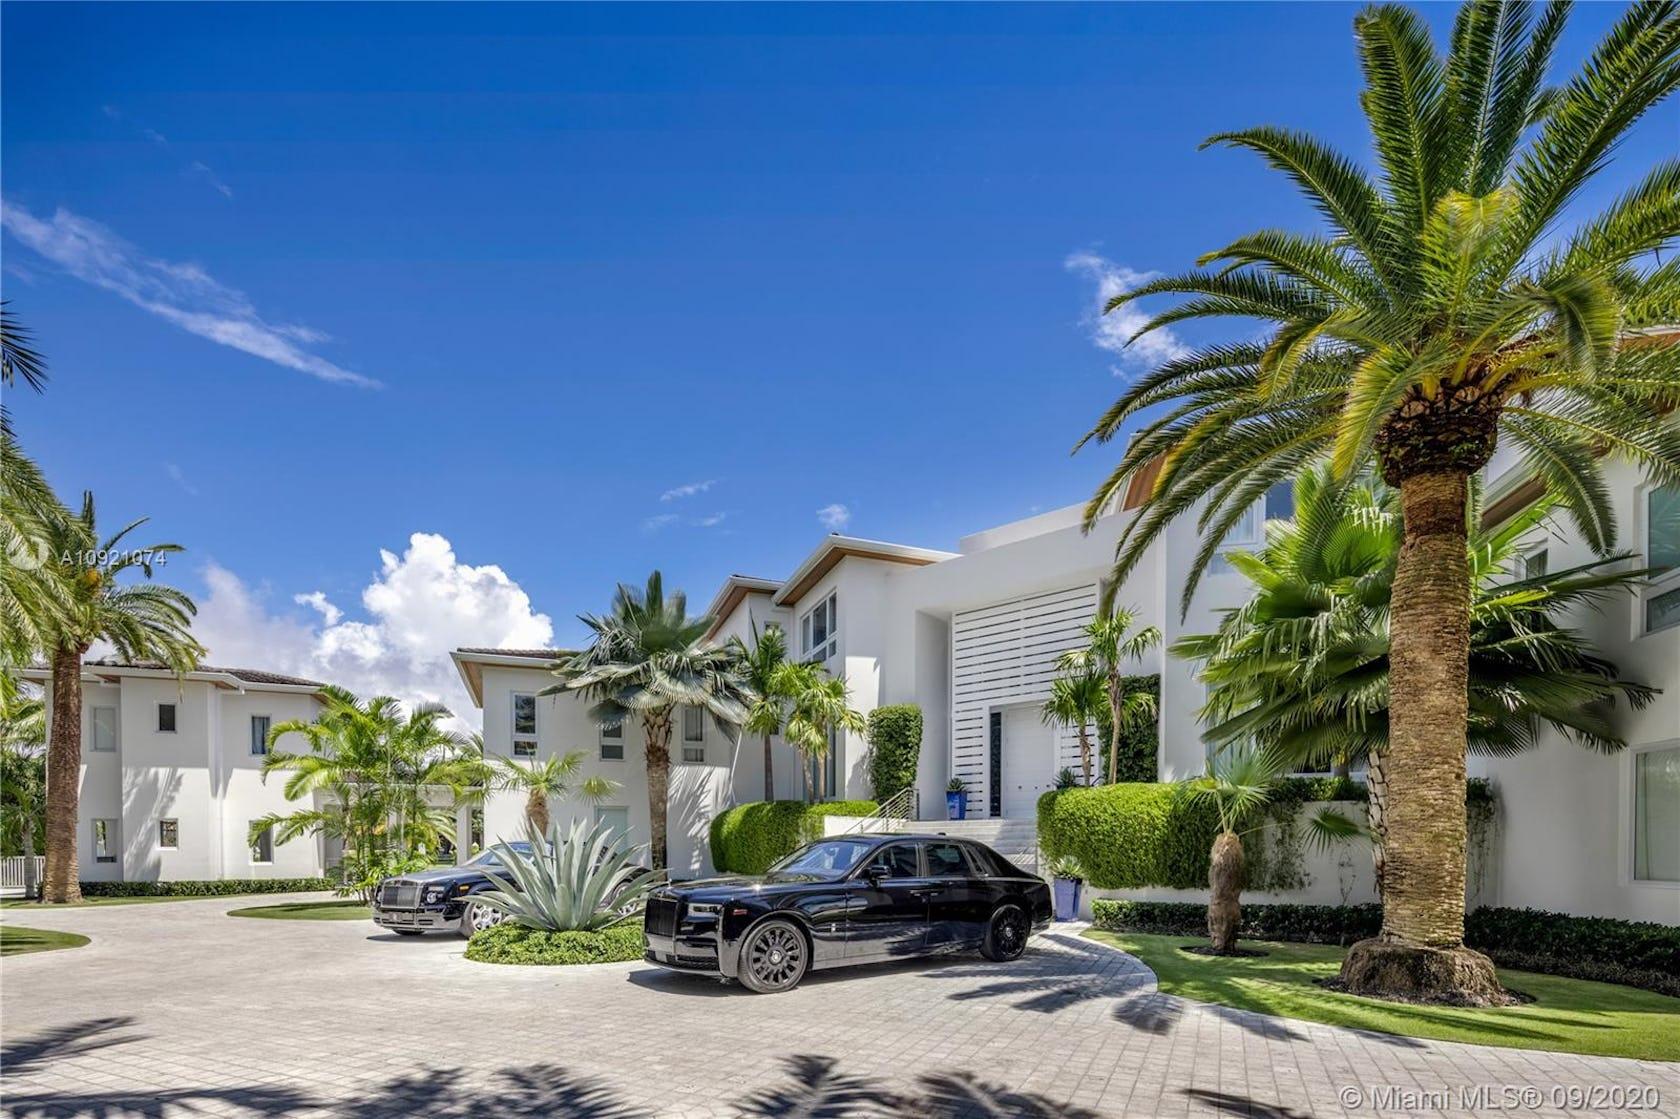 villa housing house car tree plant vegetation outdoors summer palm tree